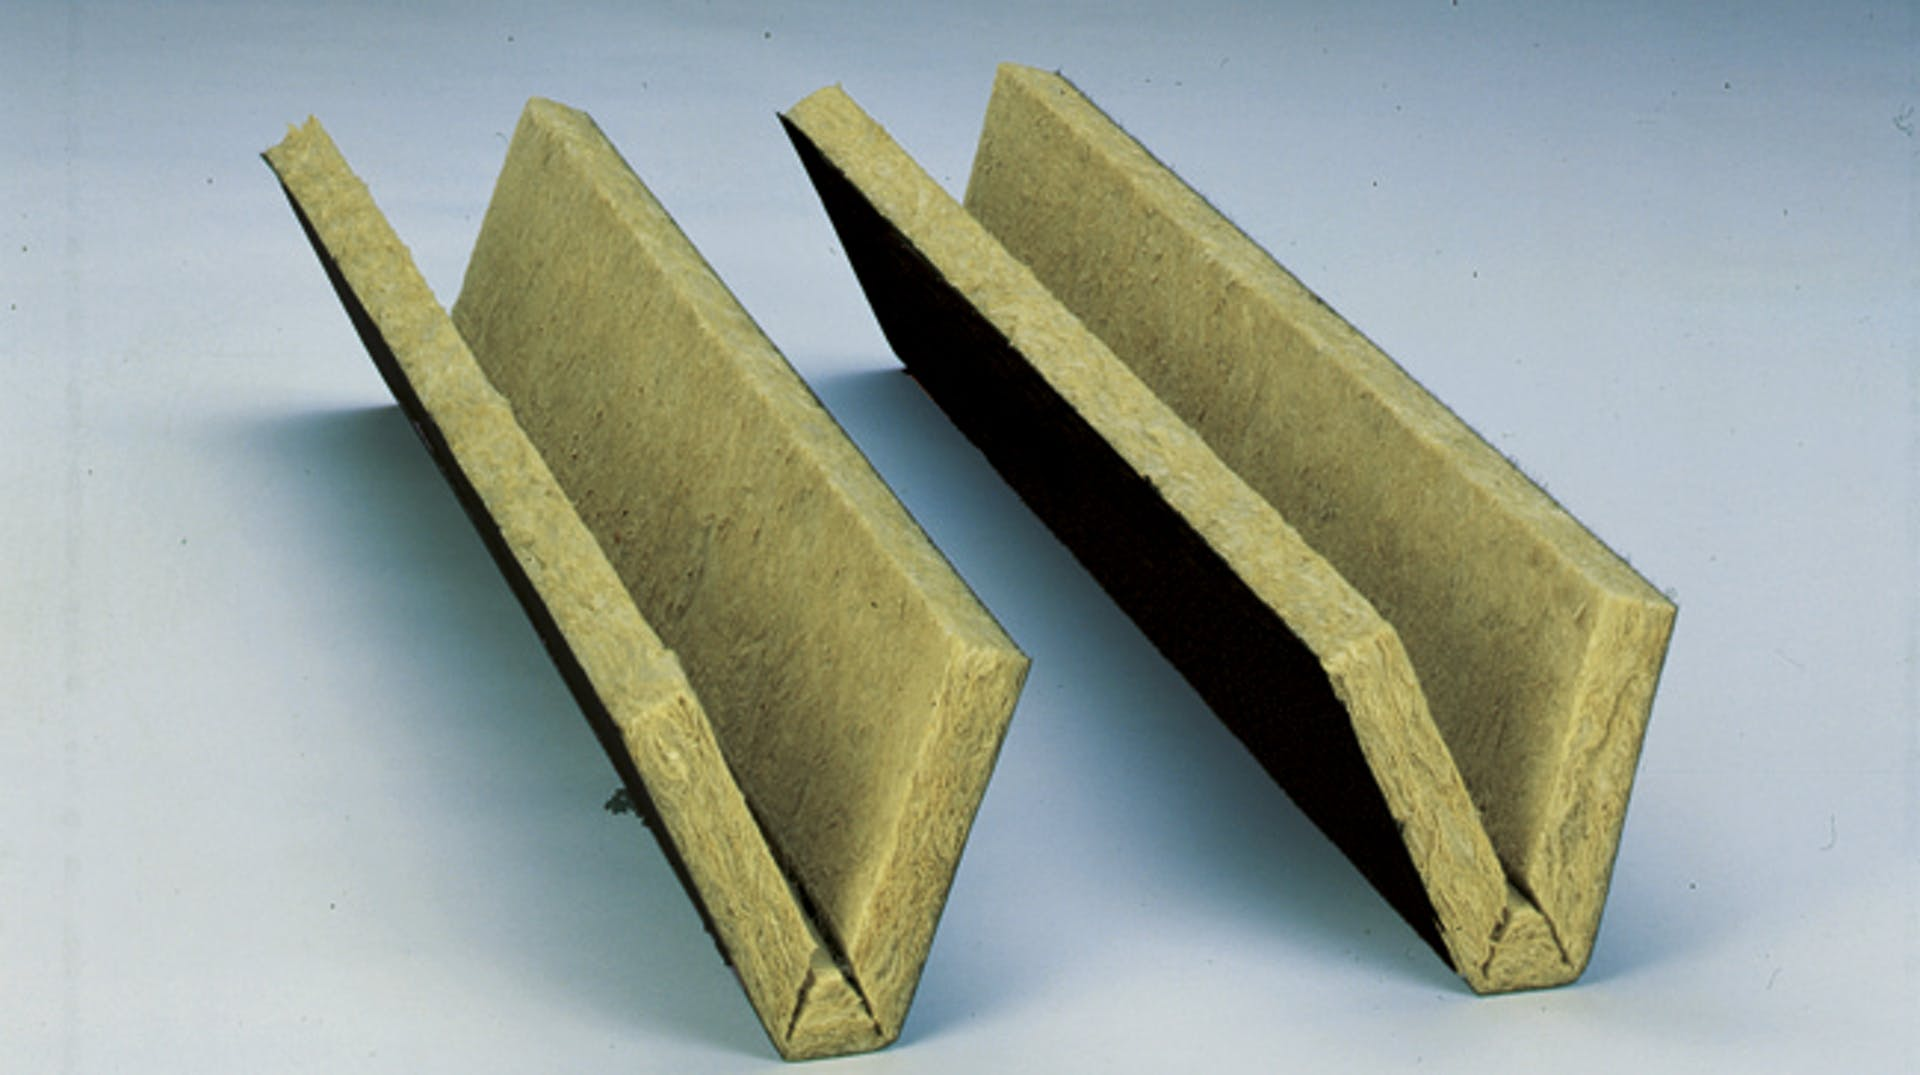 product, product page, flatroof, flat roof, akustik profilfüller raf-se, germany